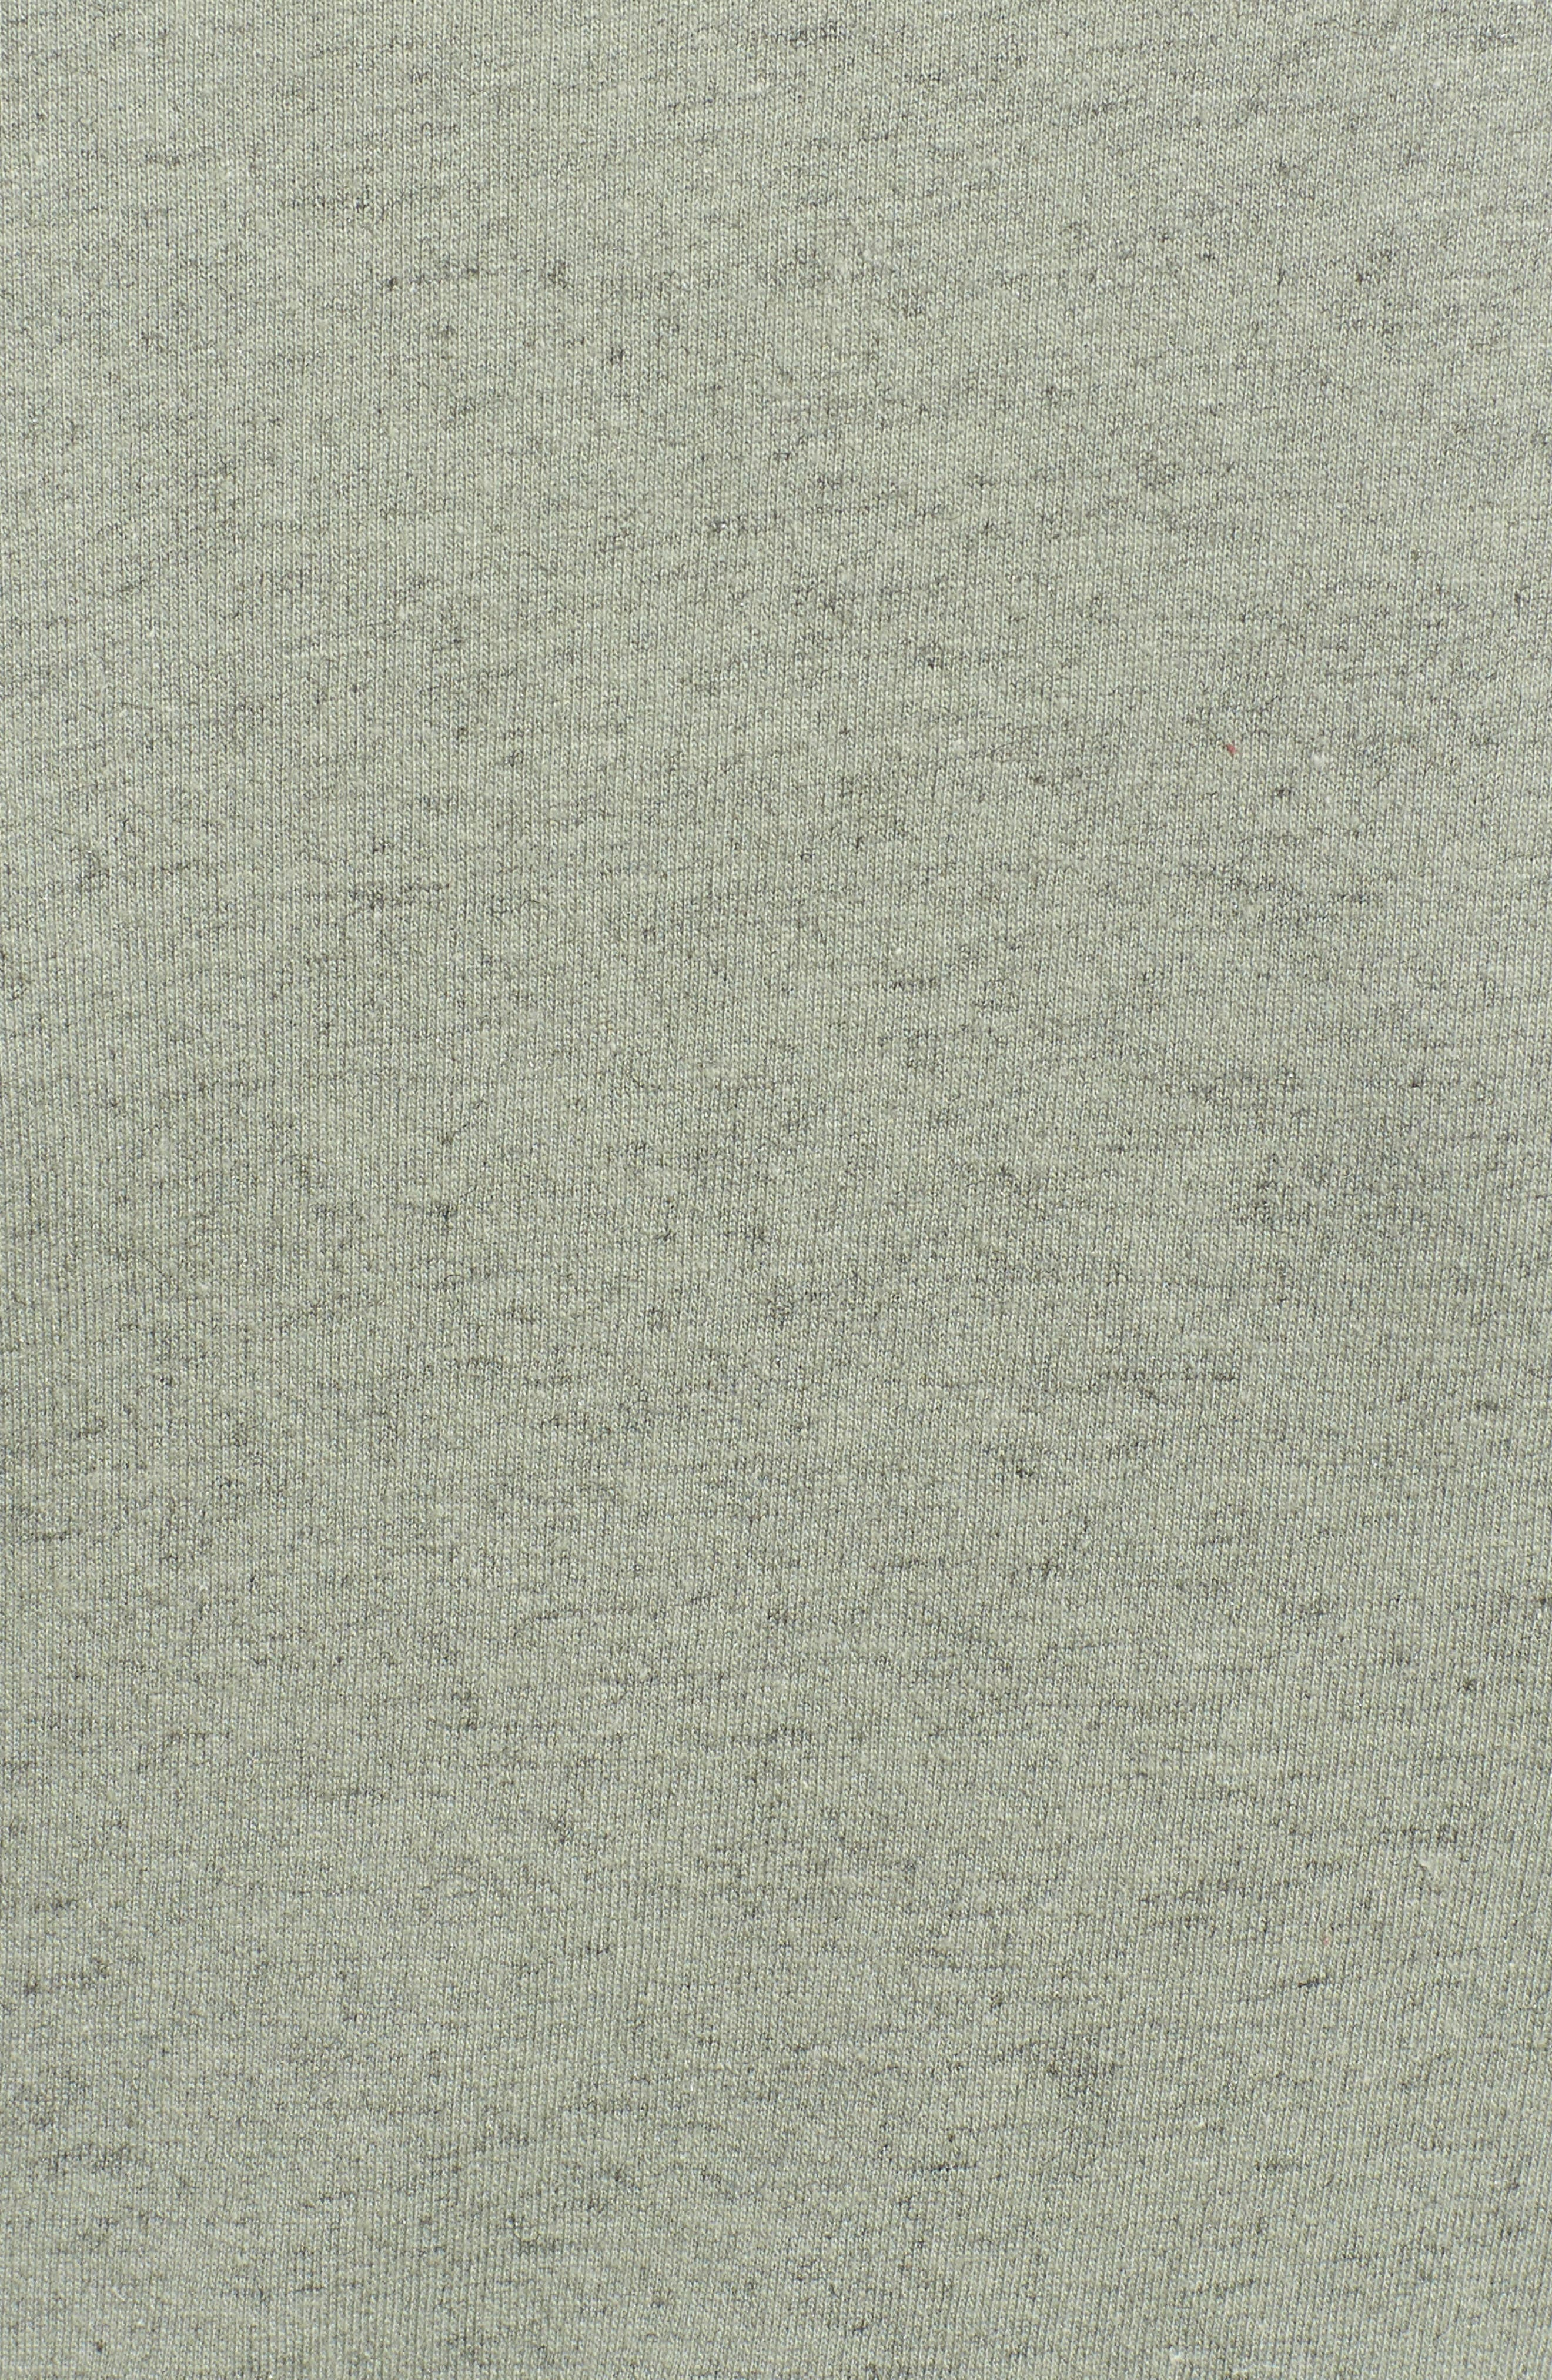 Alternate Image 5  - Caslon® Stella Knit Jacket (Regular & Petite)